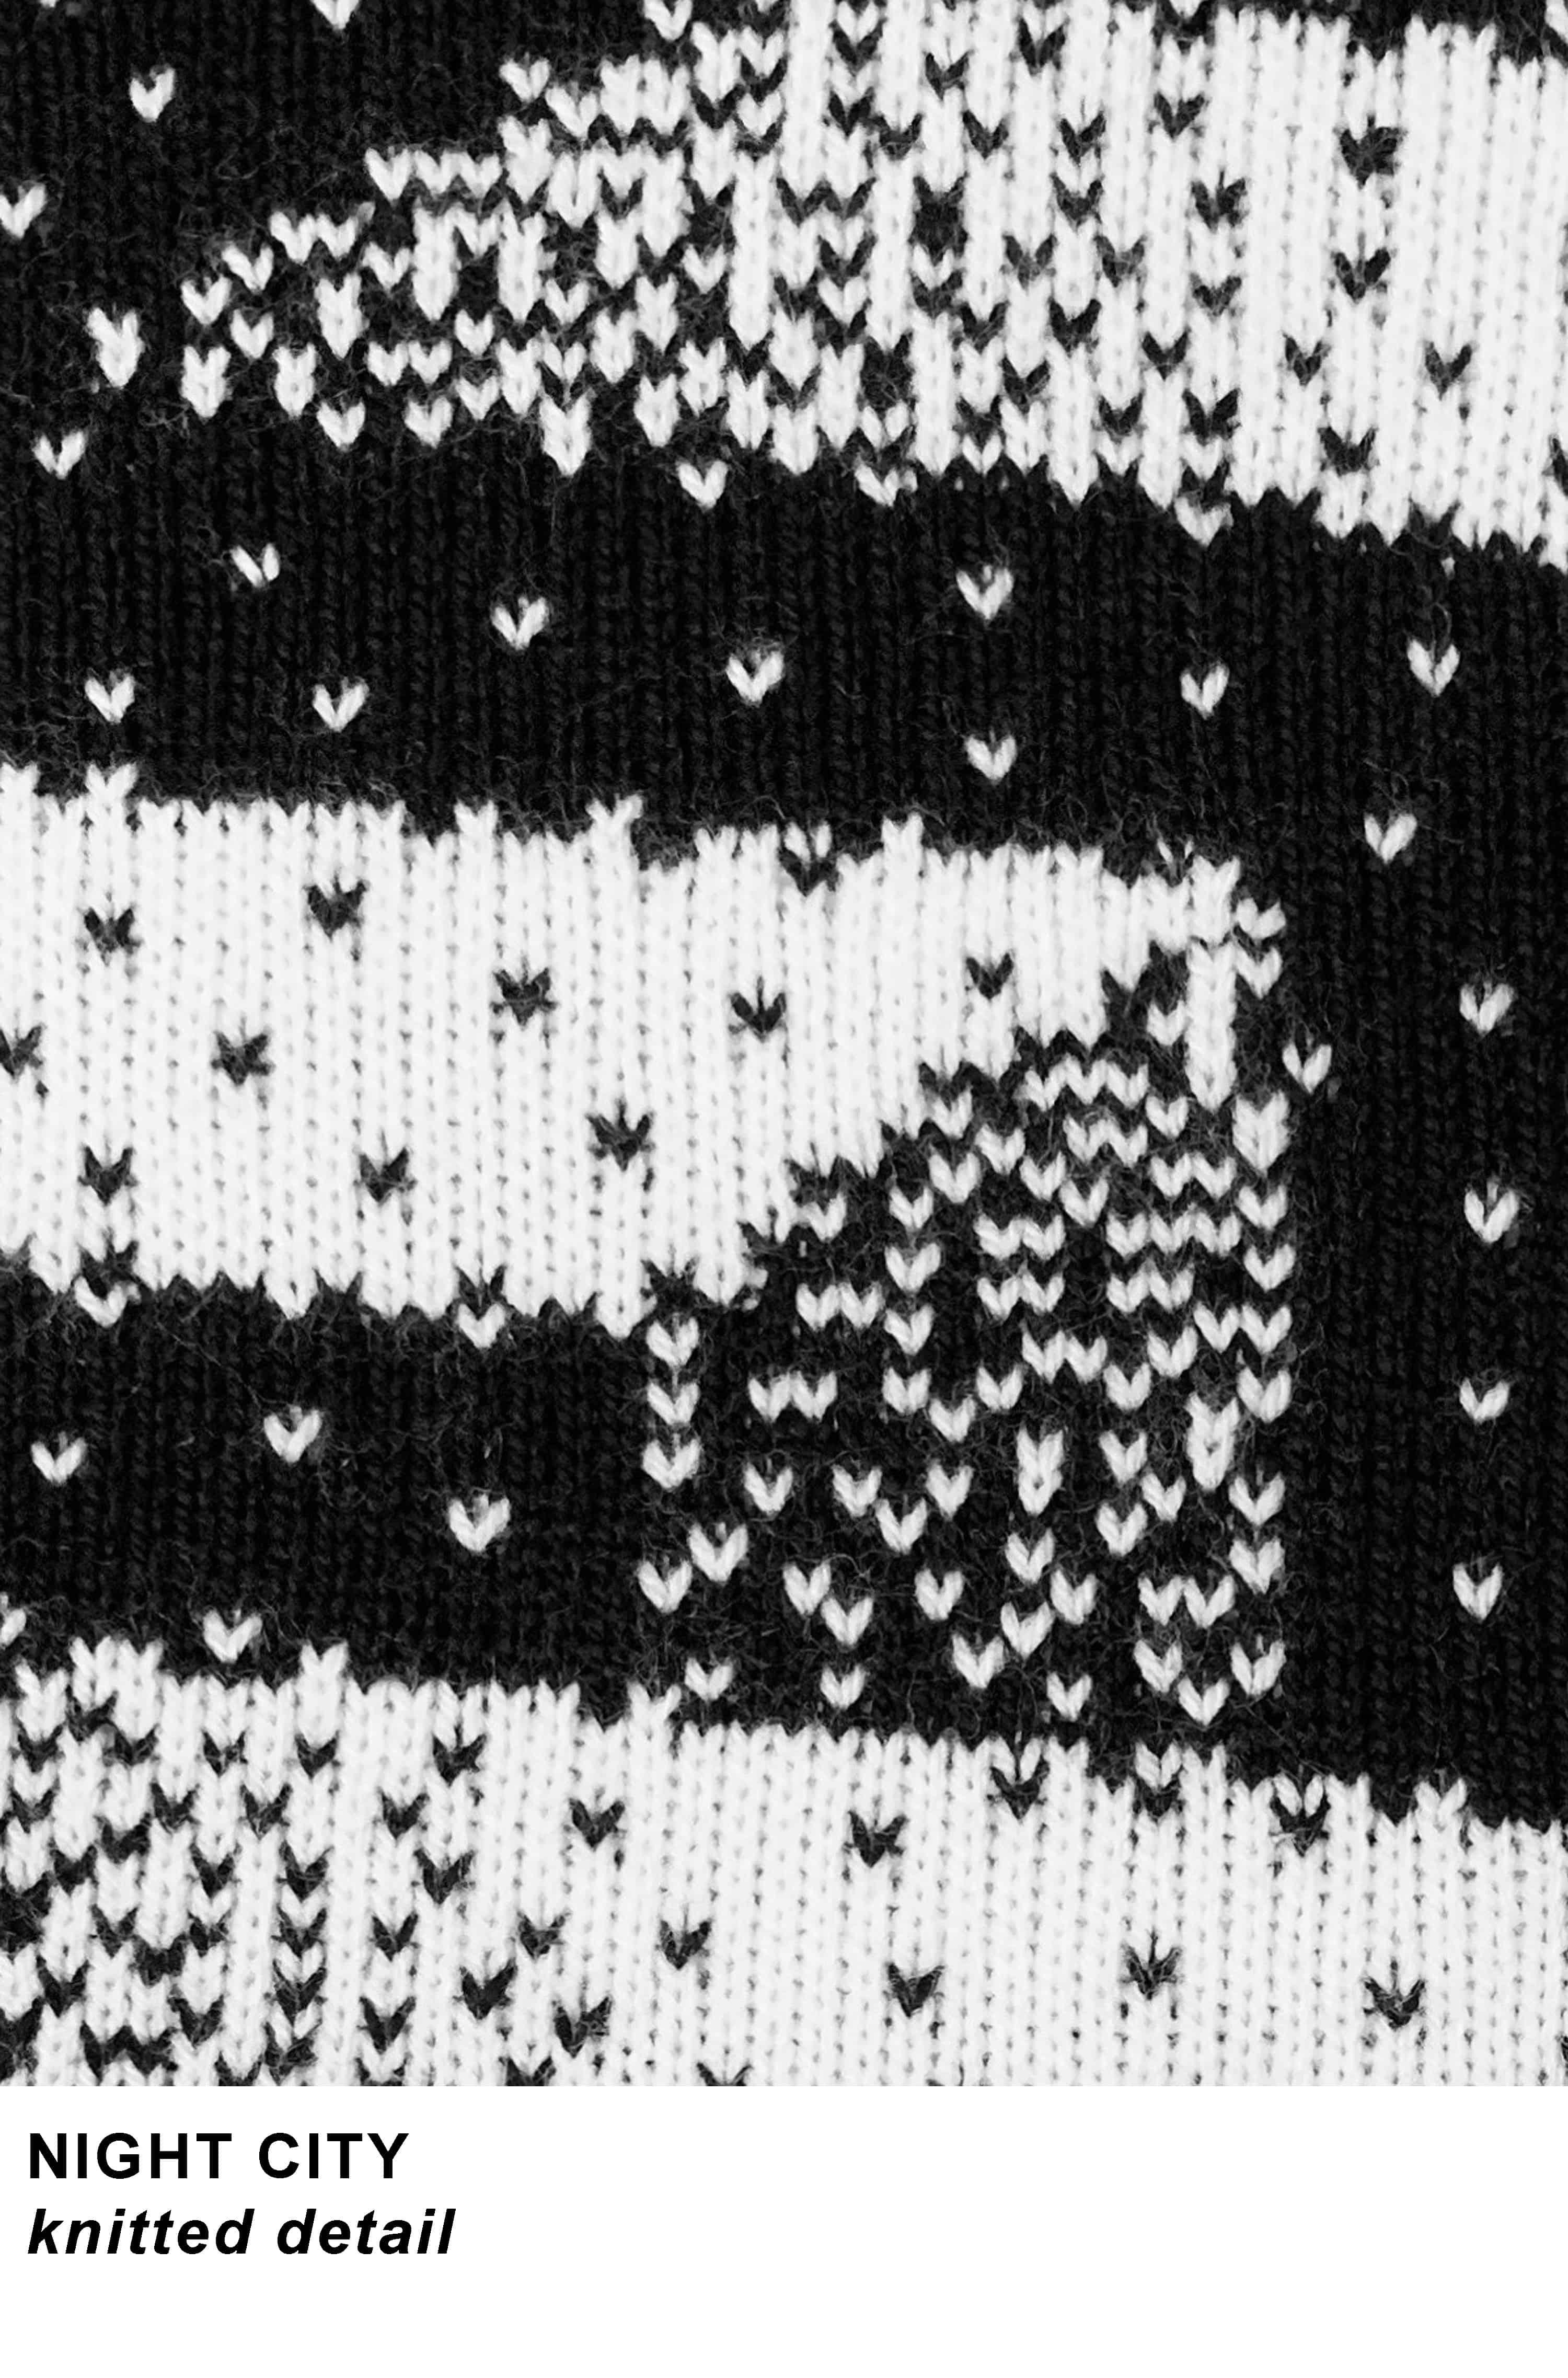 NIGHT CITY detail knitted portfolio